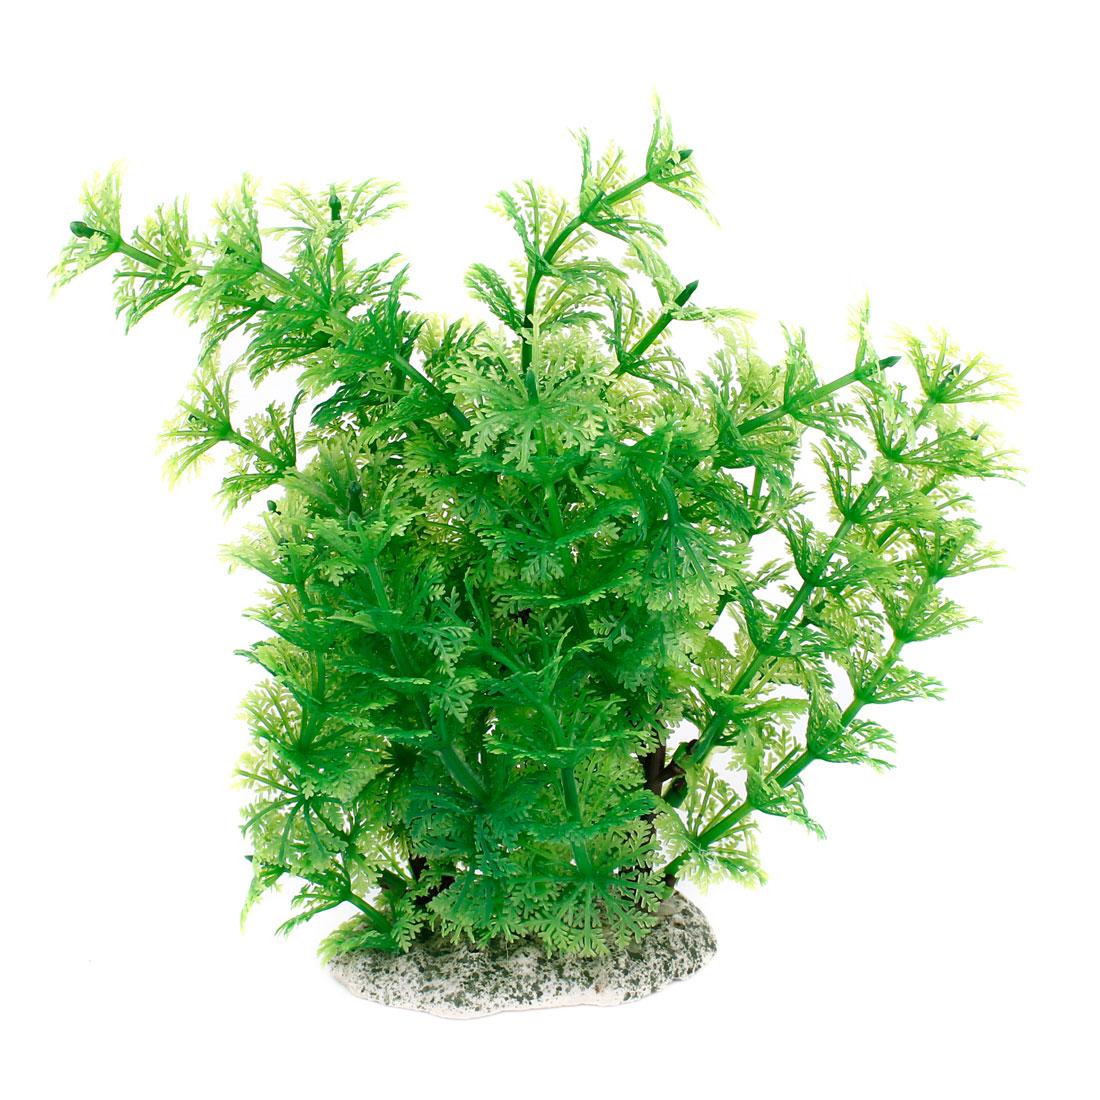 "Aquarium Ornament Plastic Simulation Water Plant Green 8"" High"